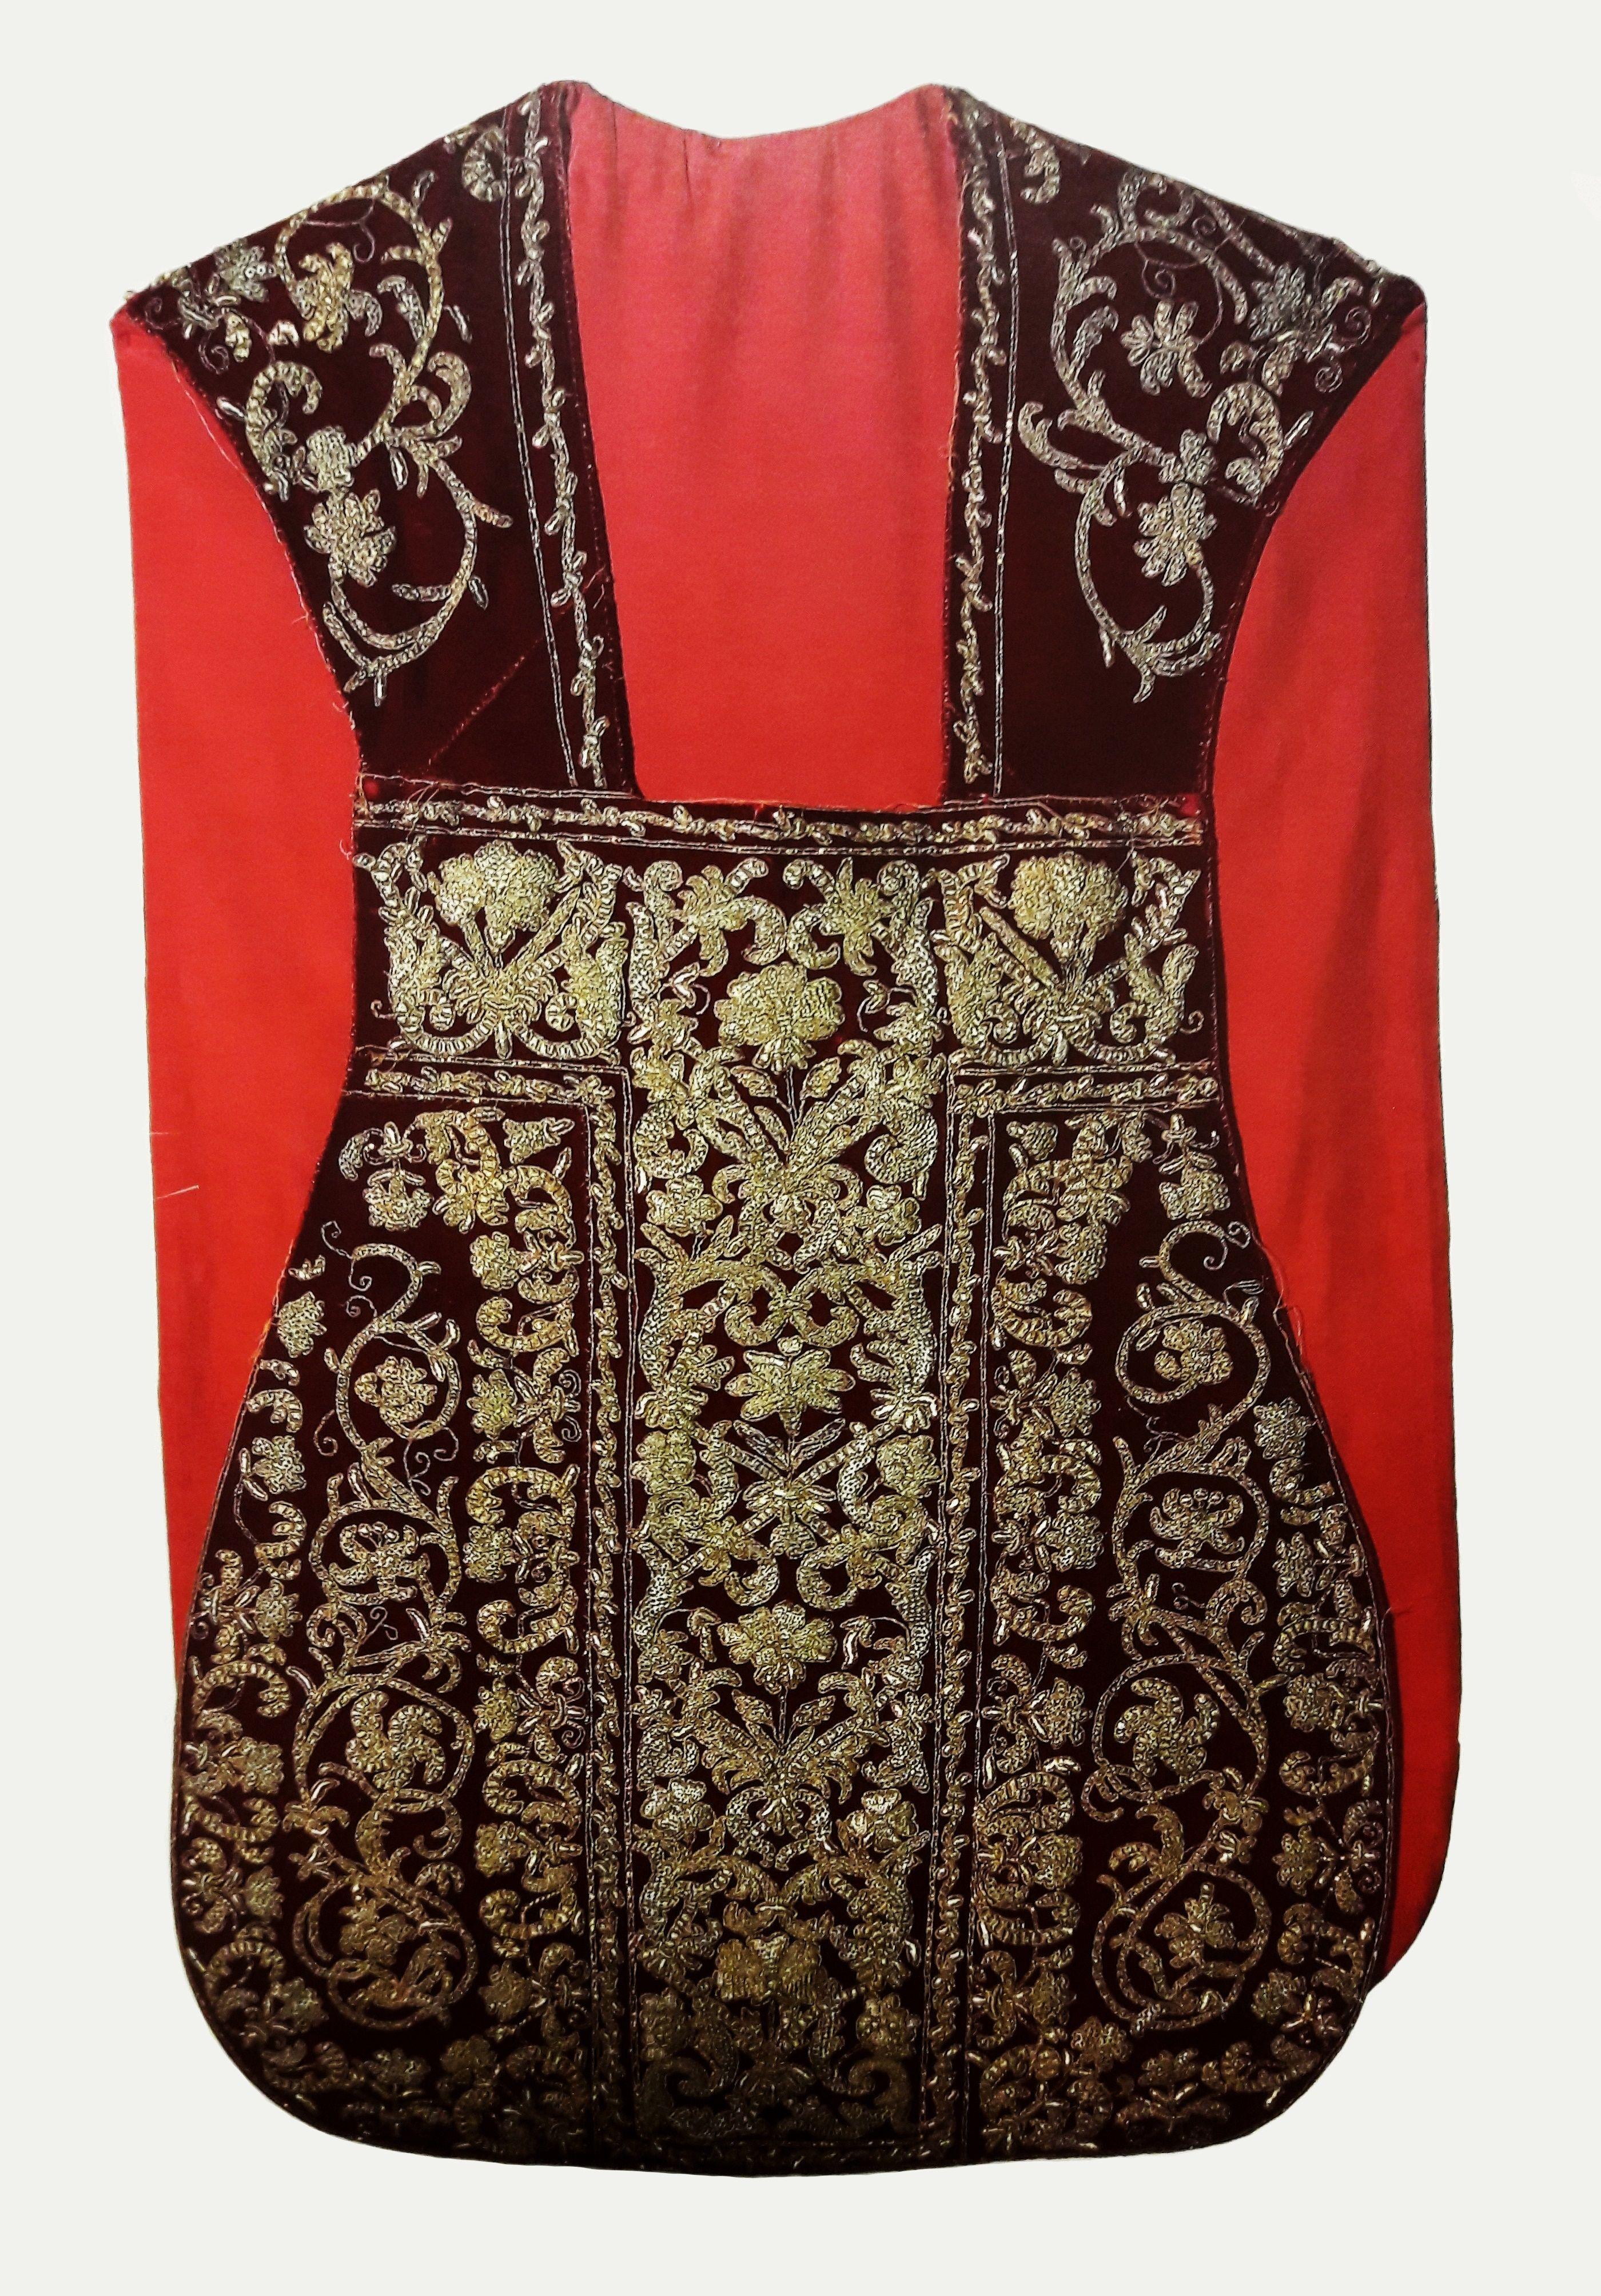 Velvet chasuble embroidered with gold thread with coat of arms of Michał Stefan Radziejowski by Anonymous from Poland, end of the 17th century, Parafia Świętego Stanisława Biskupa Męczennika w Mławie